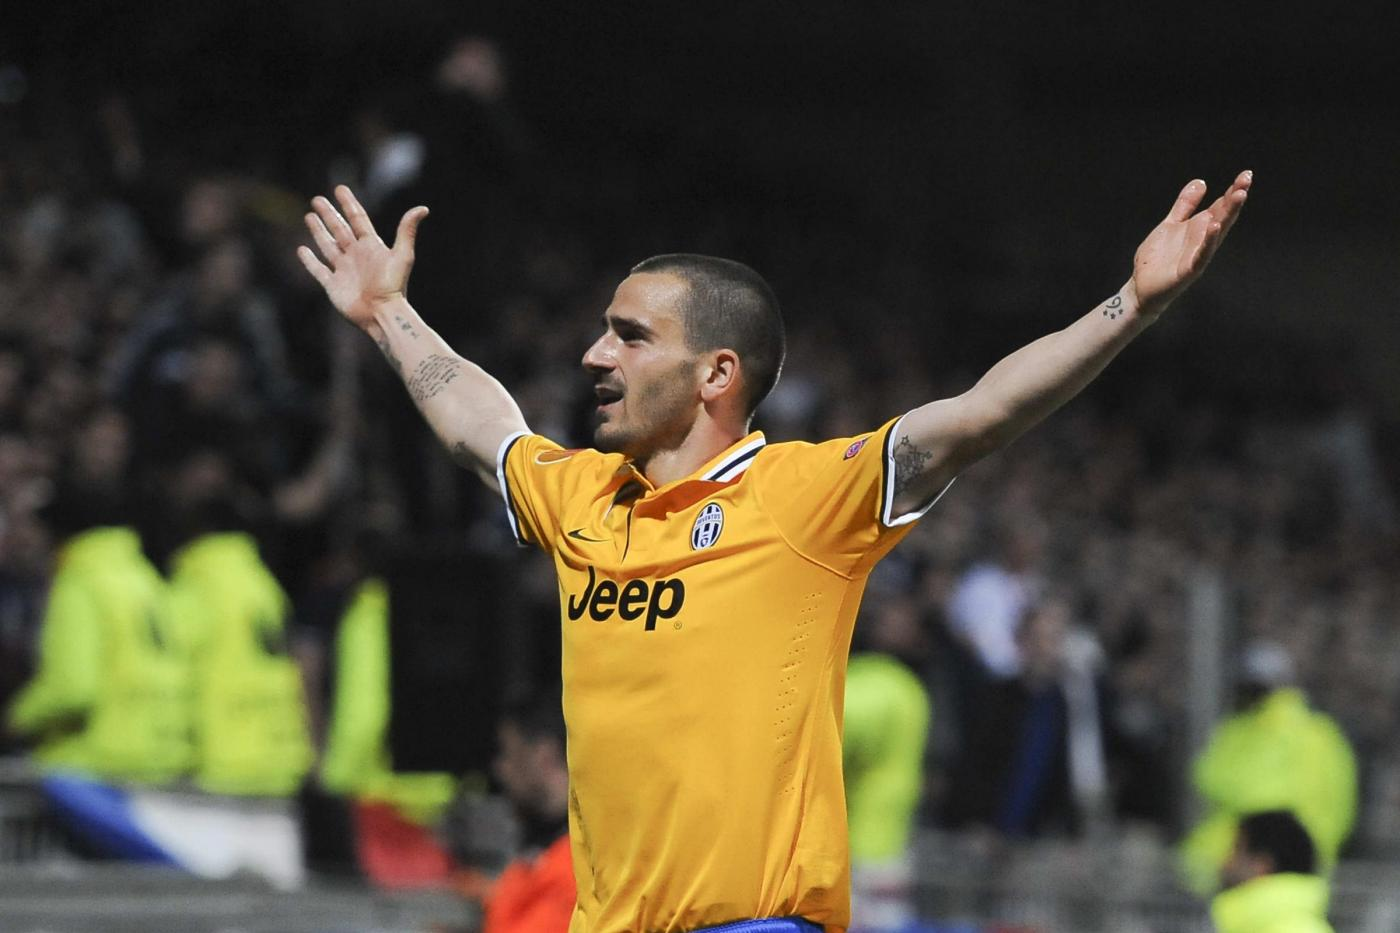 Lione vs Juventus 0-1: vittoria stentata in Europa League